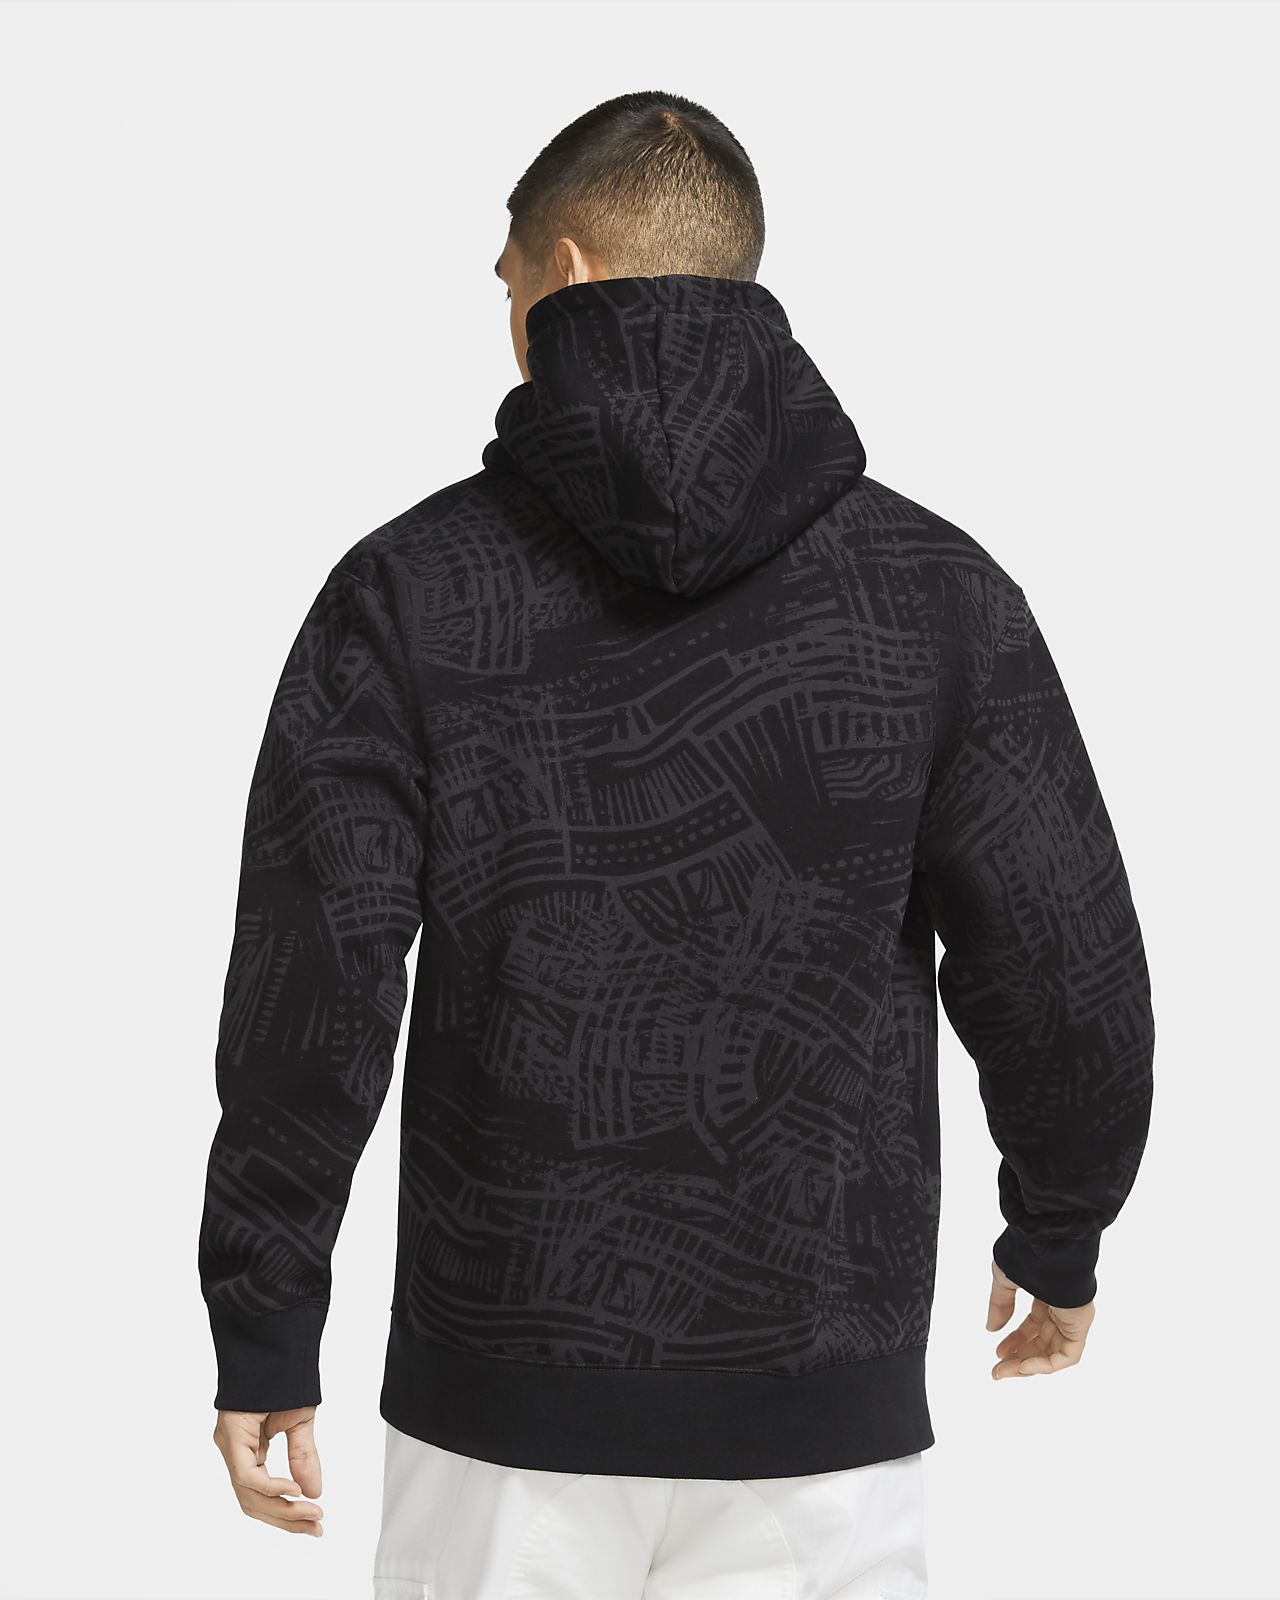 nike japanese logo hoodie